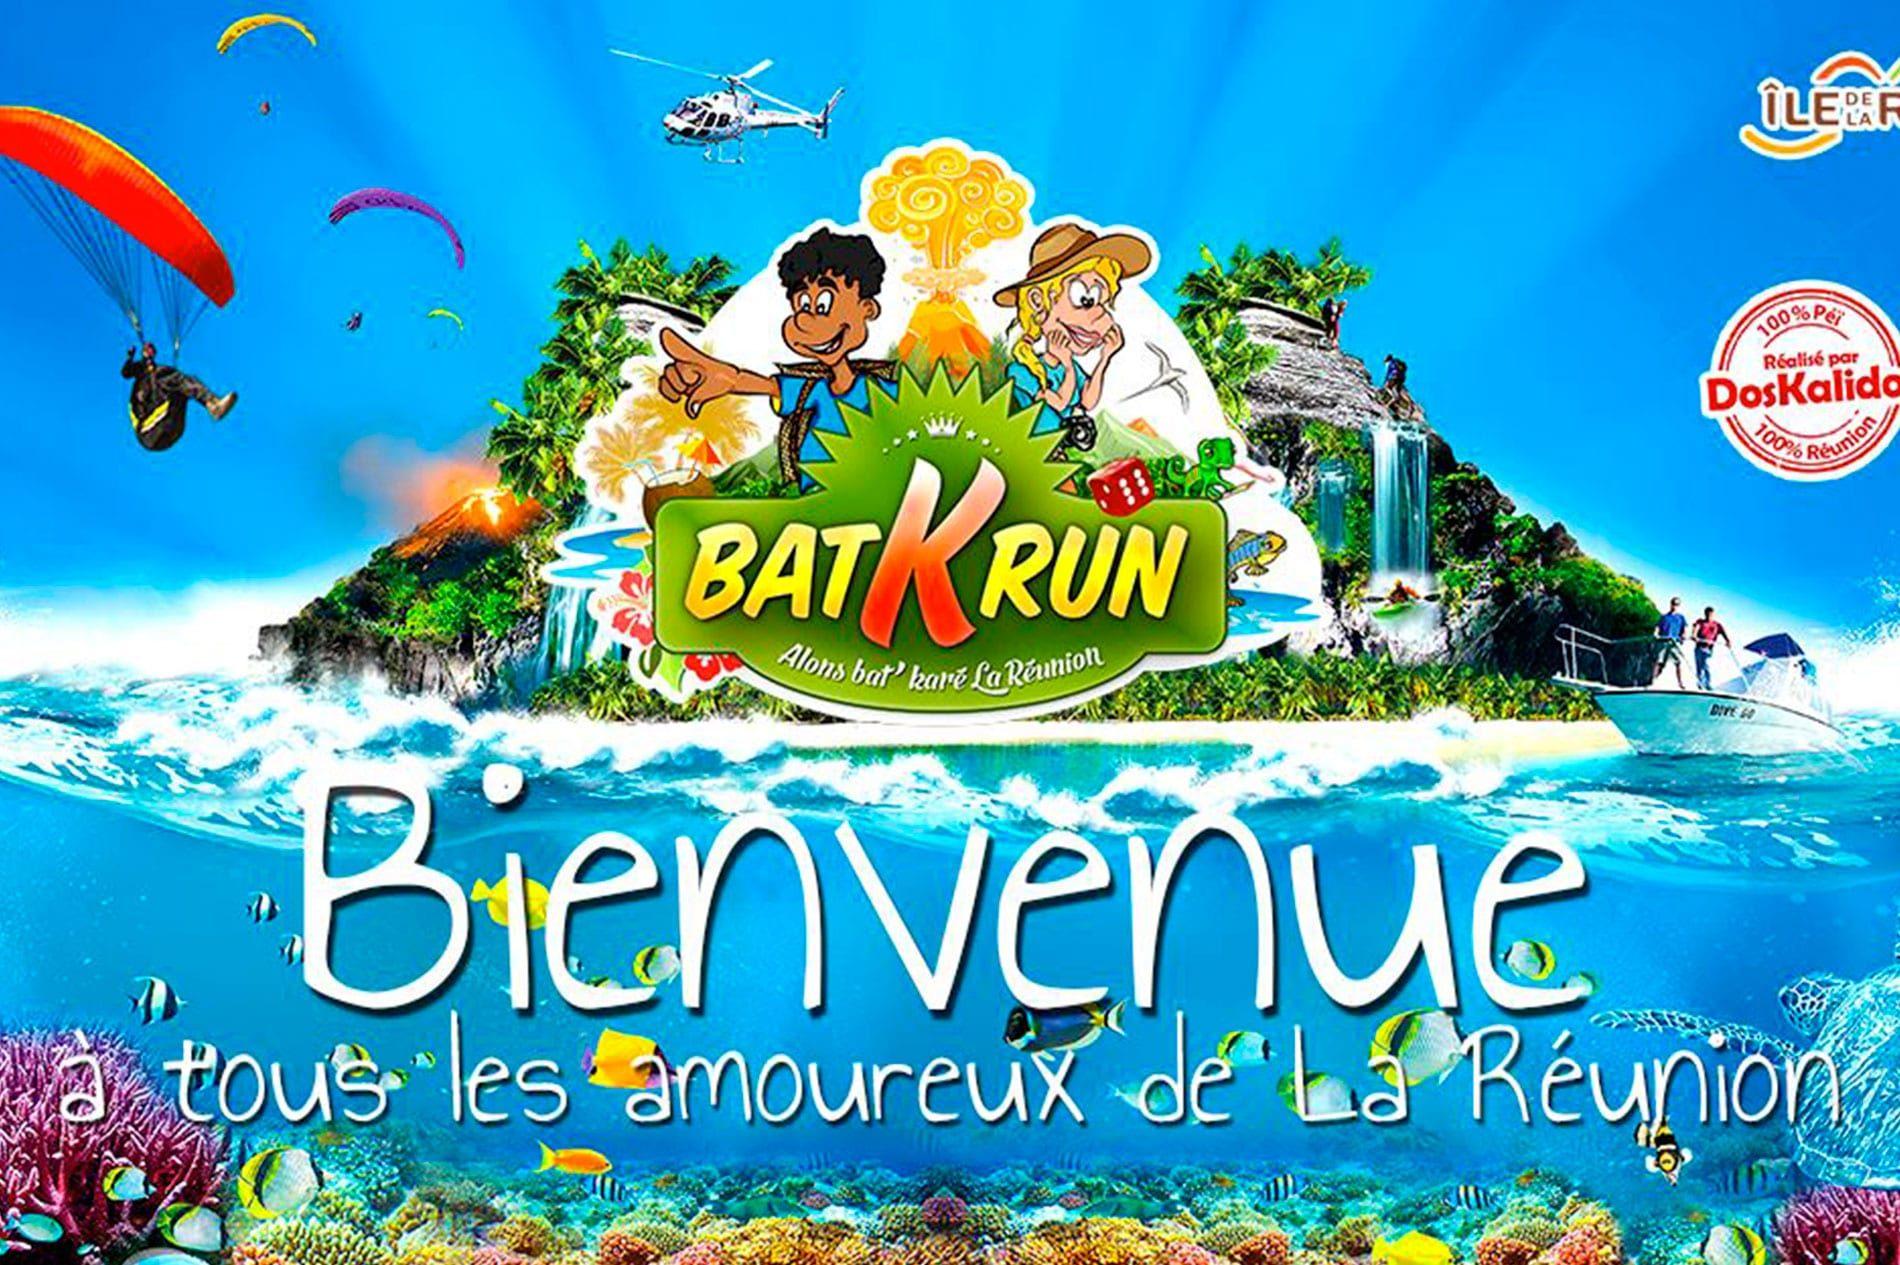 ACCEUIL-Batkrun, the new Reunion Island game